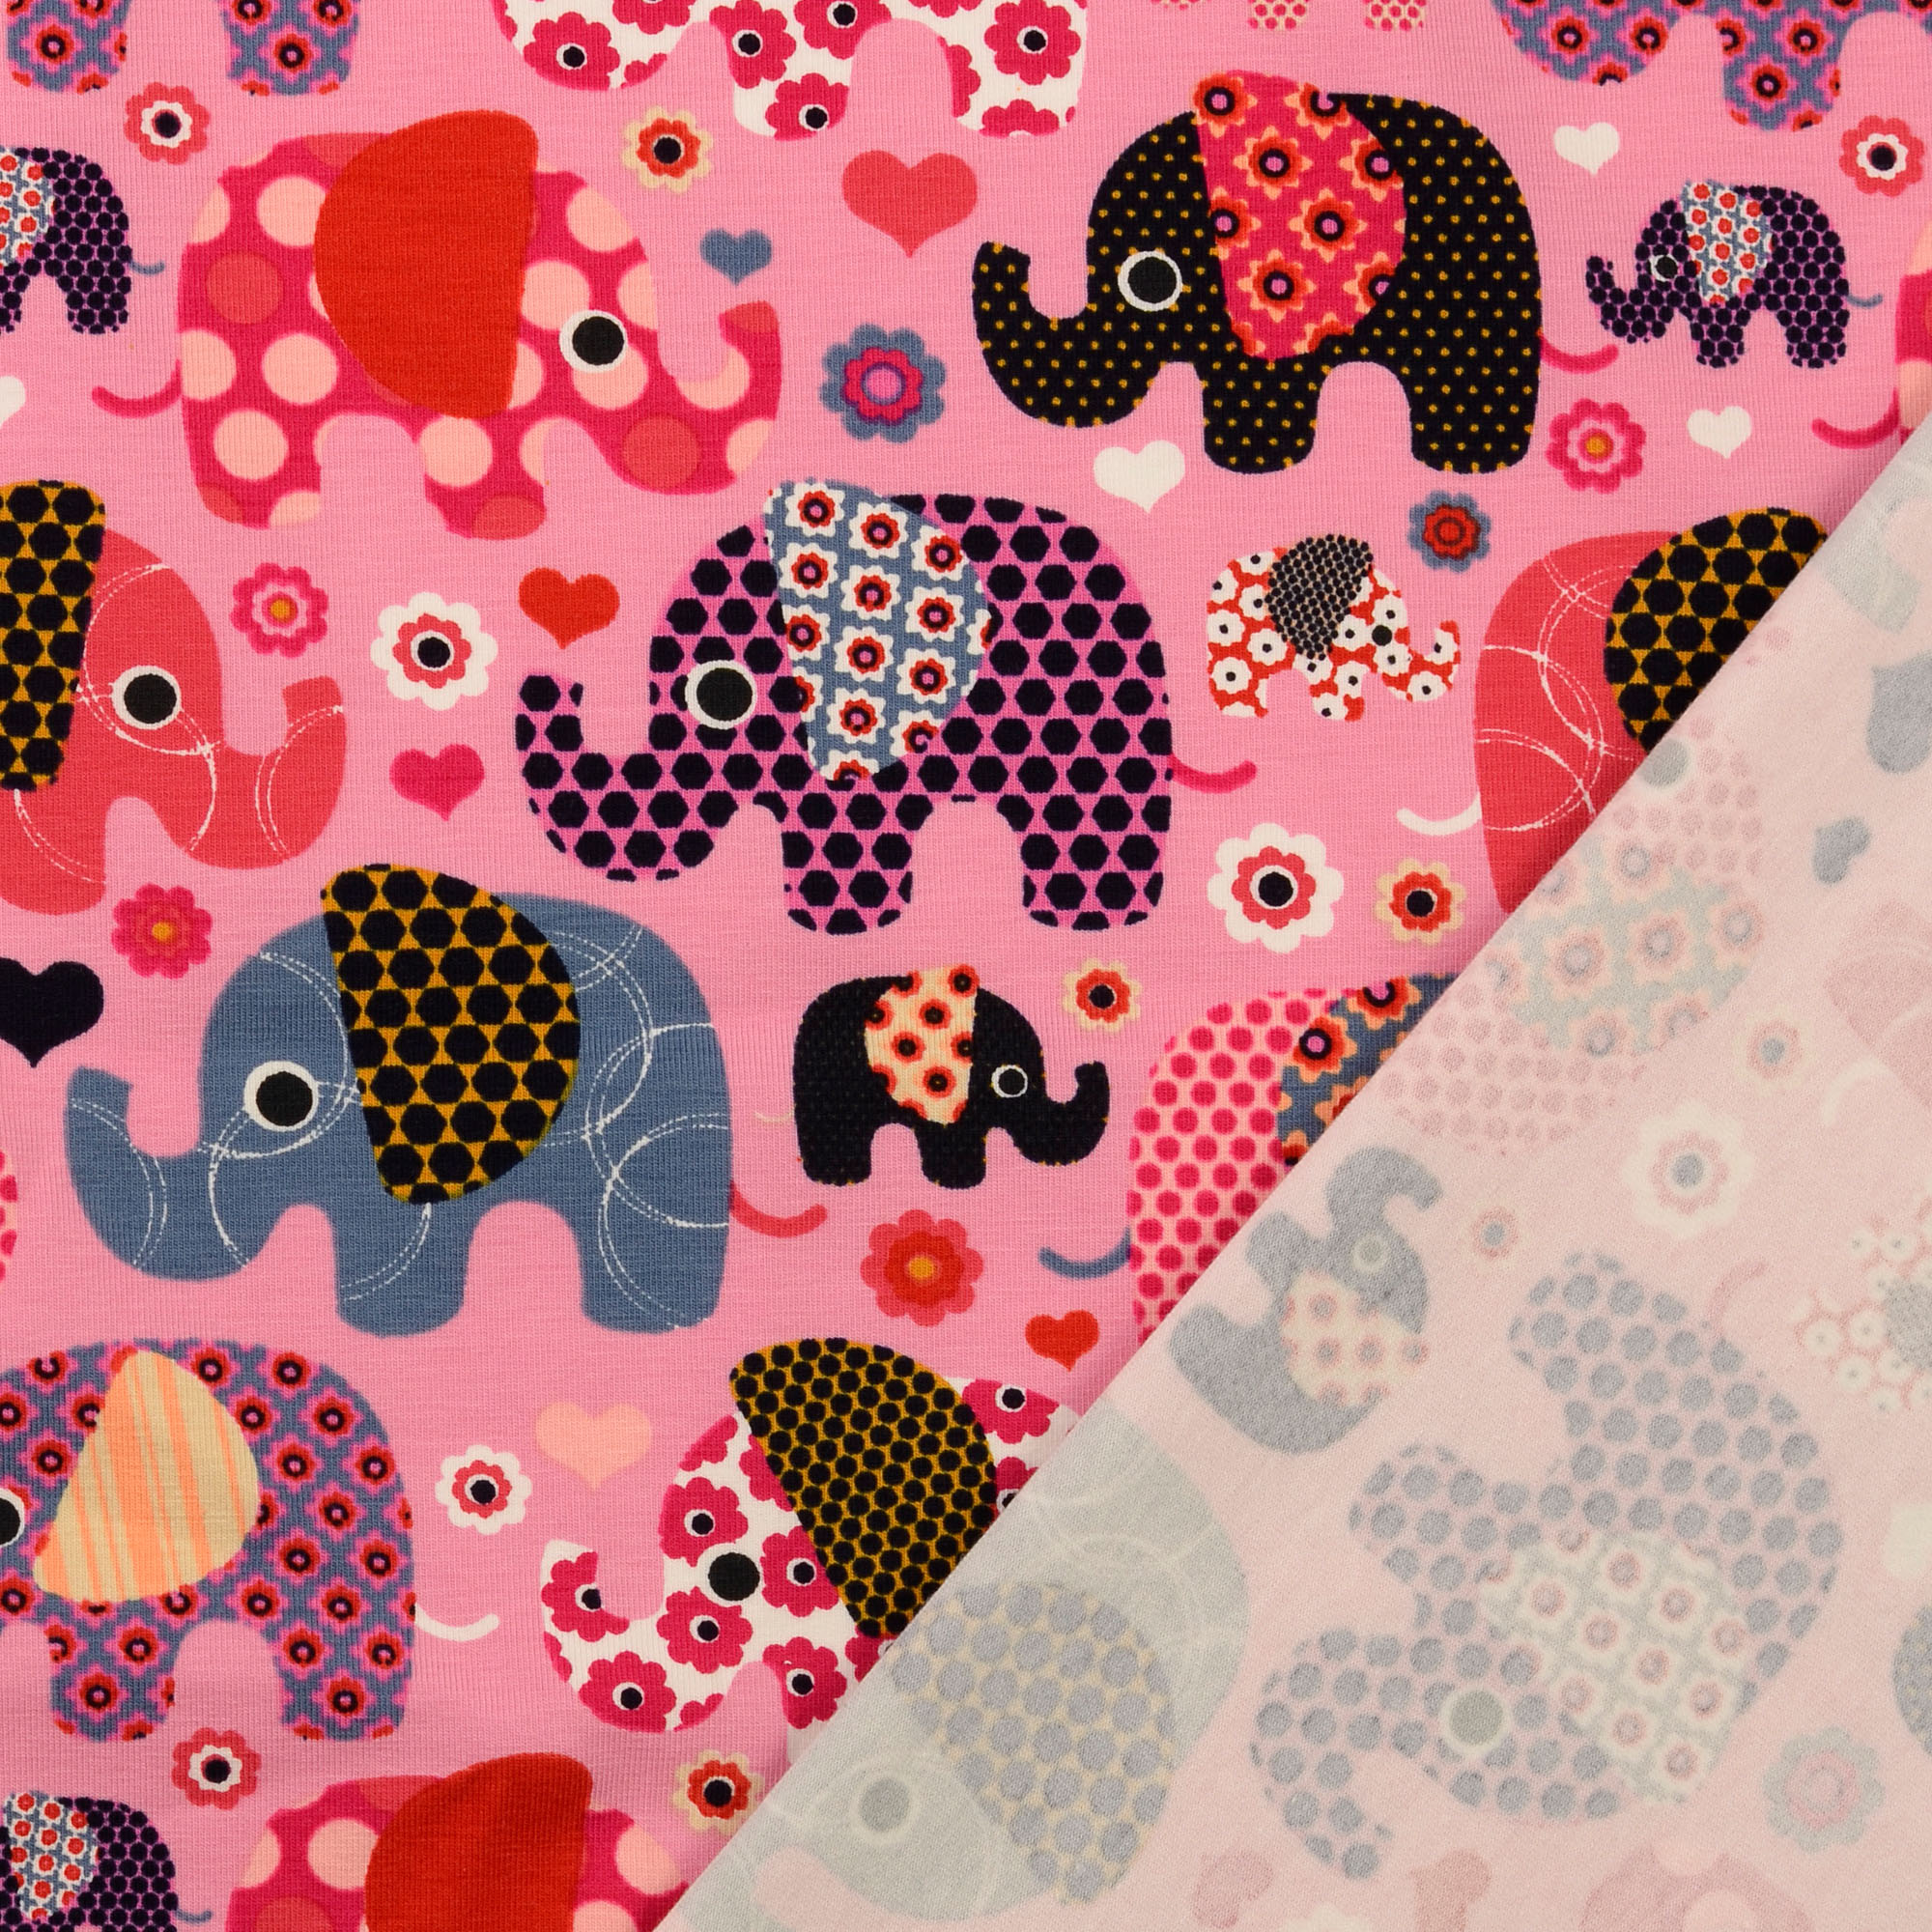 Baumwolljersey Elefanten pink Kinderstoff Preis=0,5m